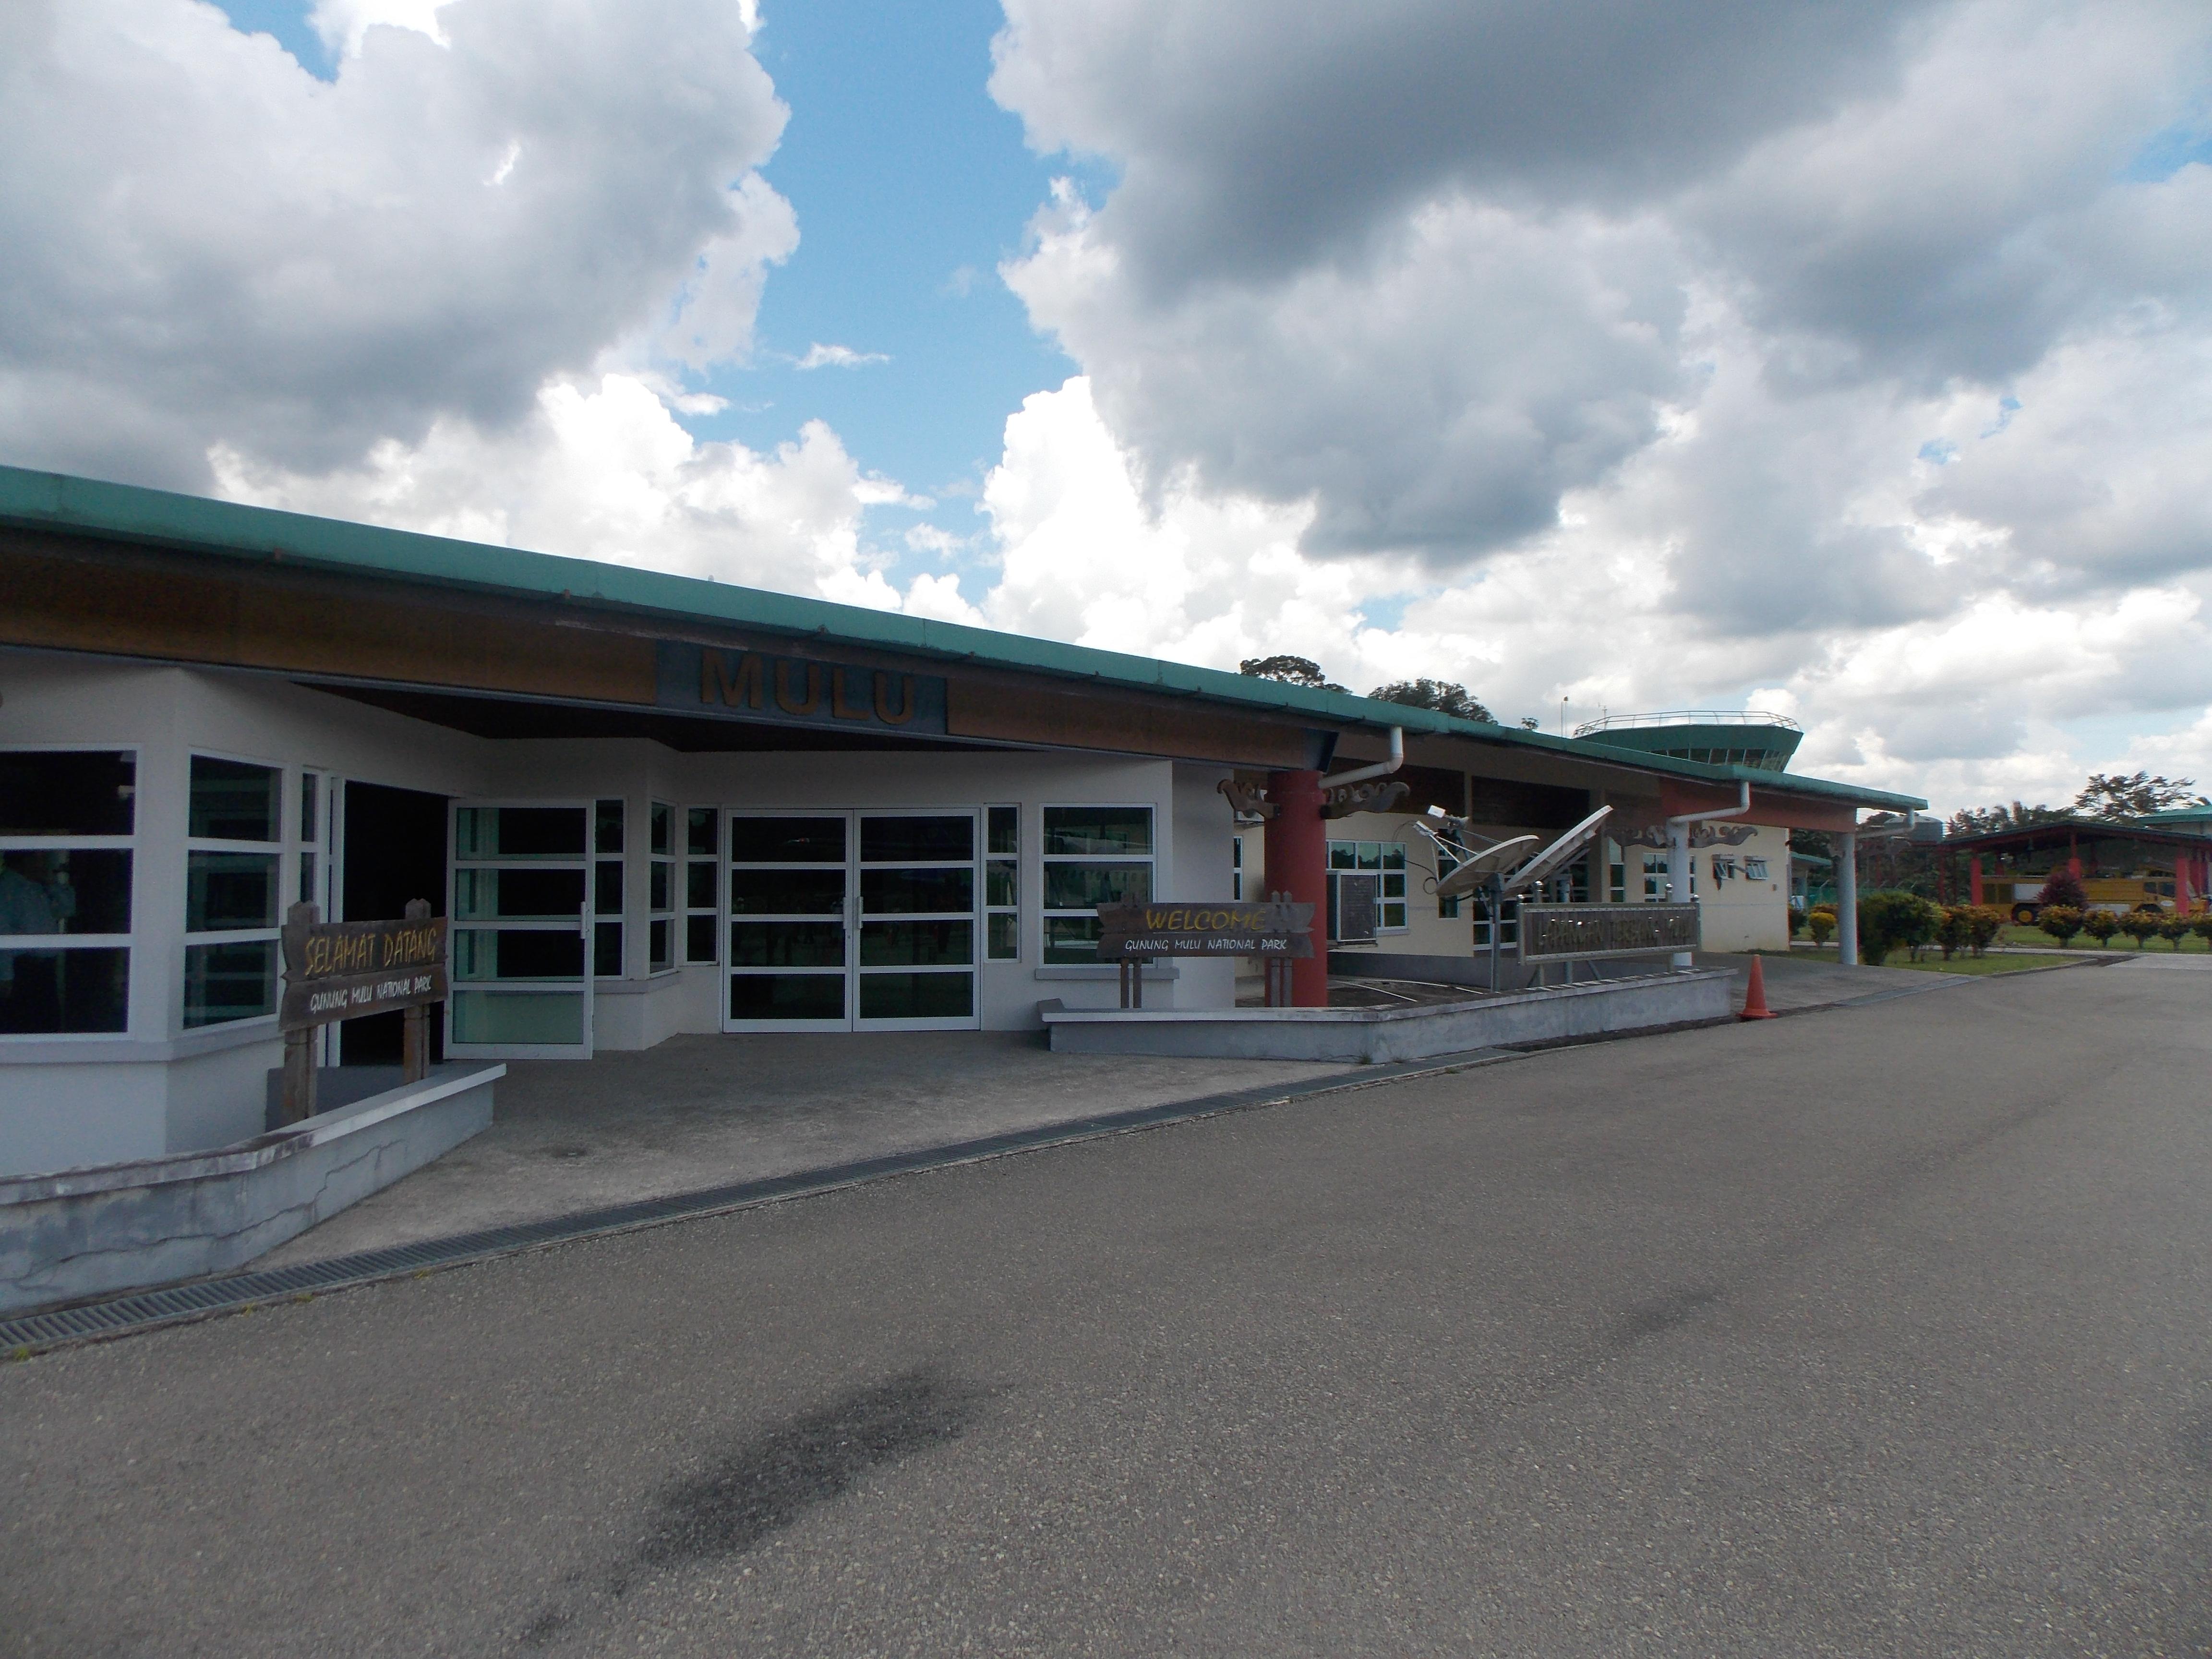 006-mulu-airport-terminal-building